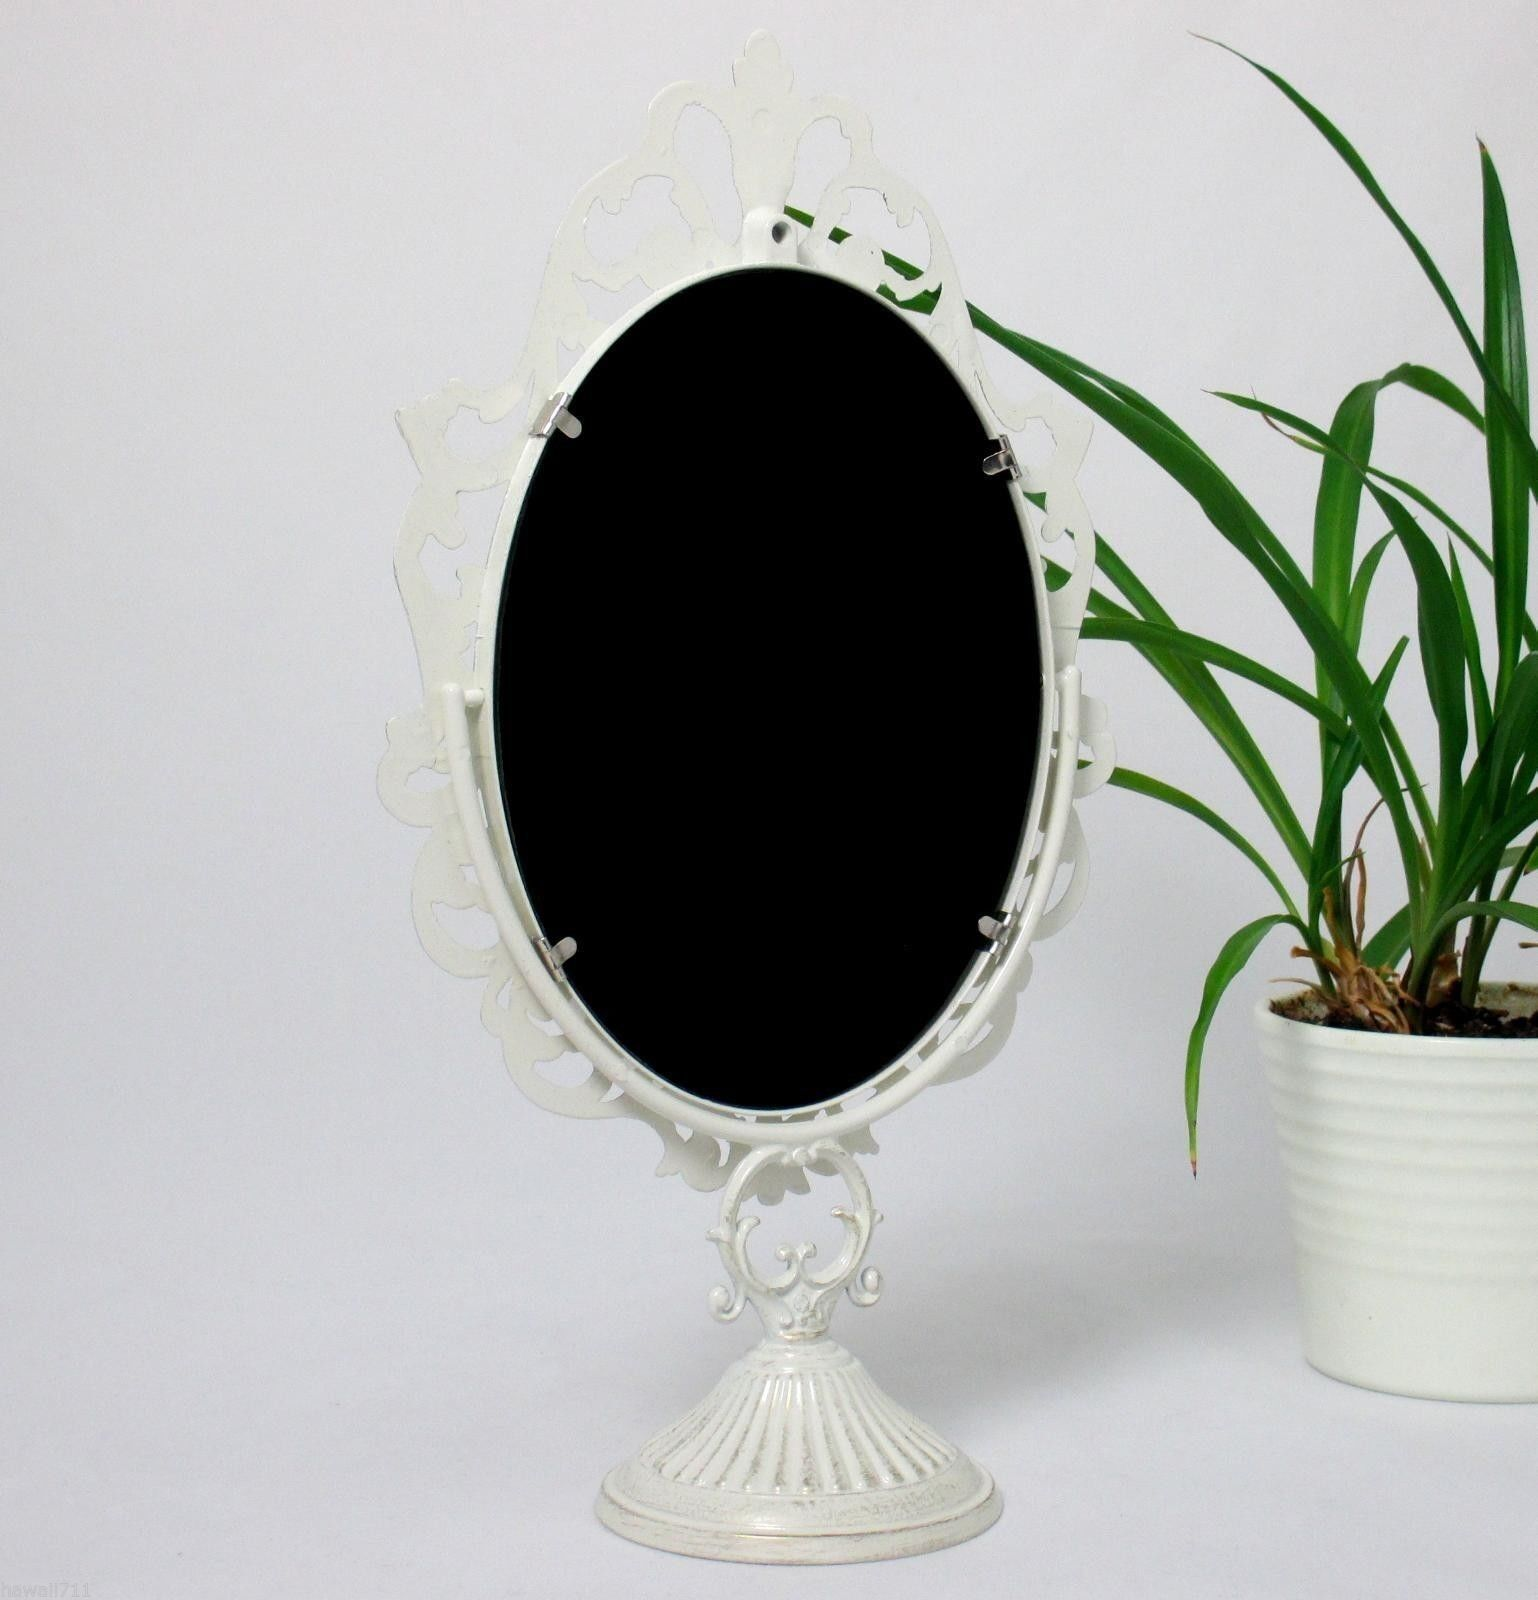 standspiegel deko spiegel kippspiegel schminkspiegel kosmetikspiegel antik 32 cm eur 29 85. Black Bedroom Furniture Sets. Home Design Ideas